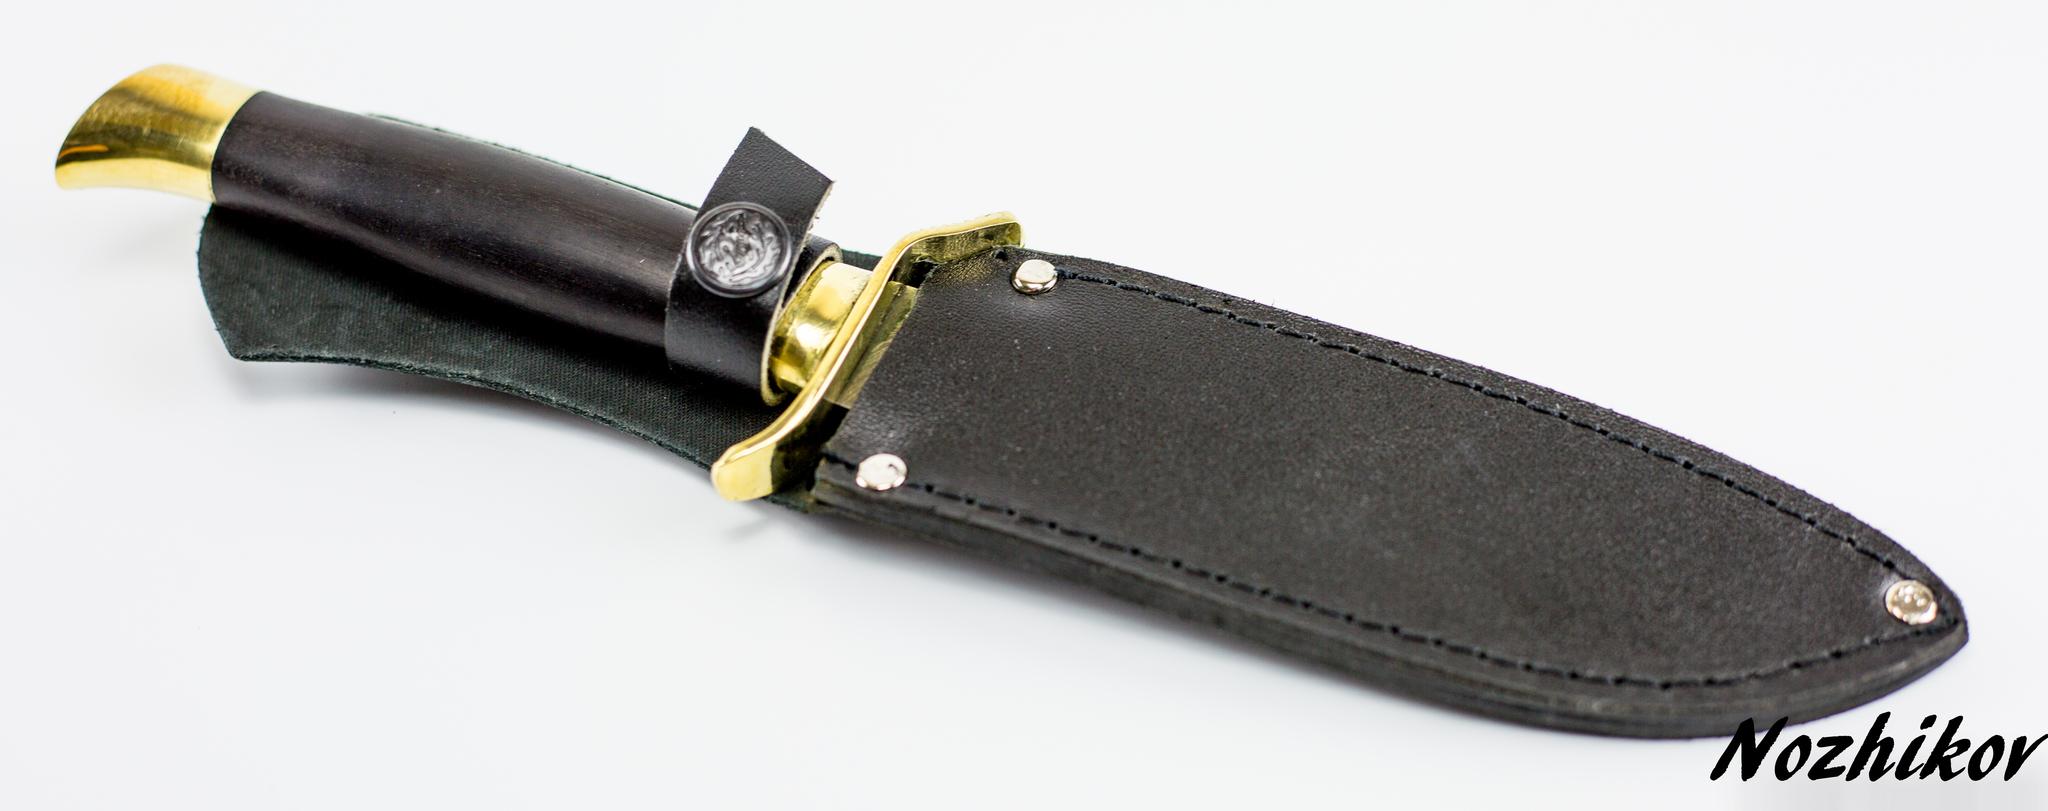 Фото 5 - Нож НР-40, сталь дамаск, граб от Промтехснаб